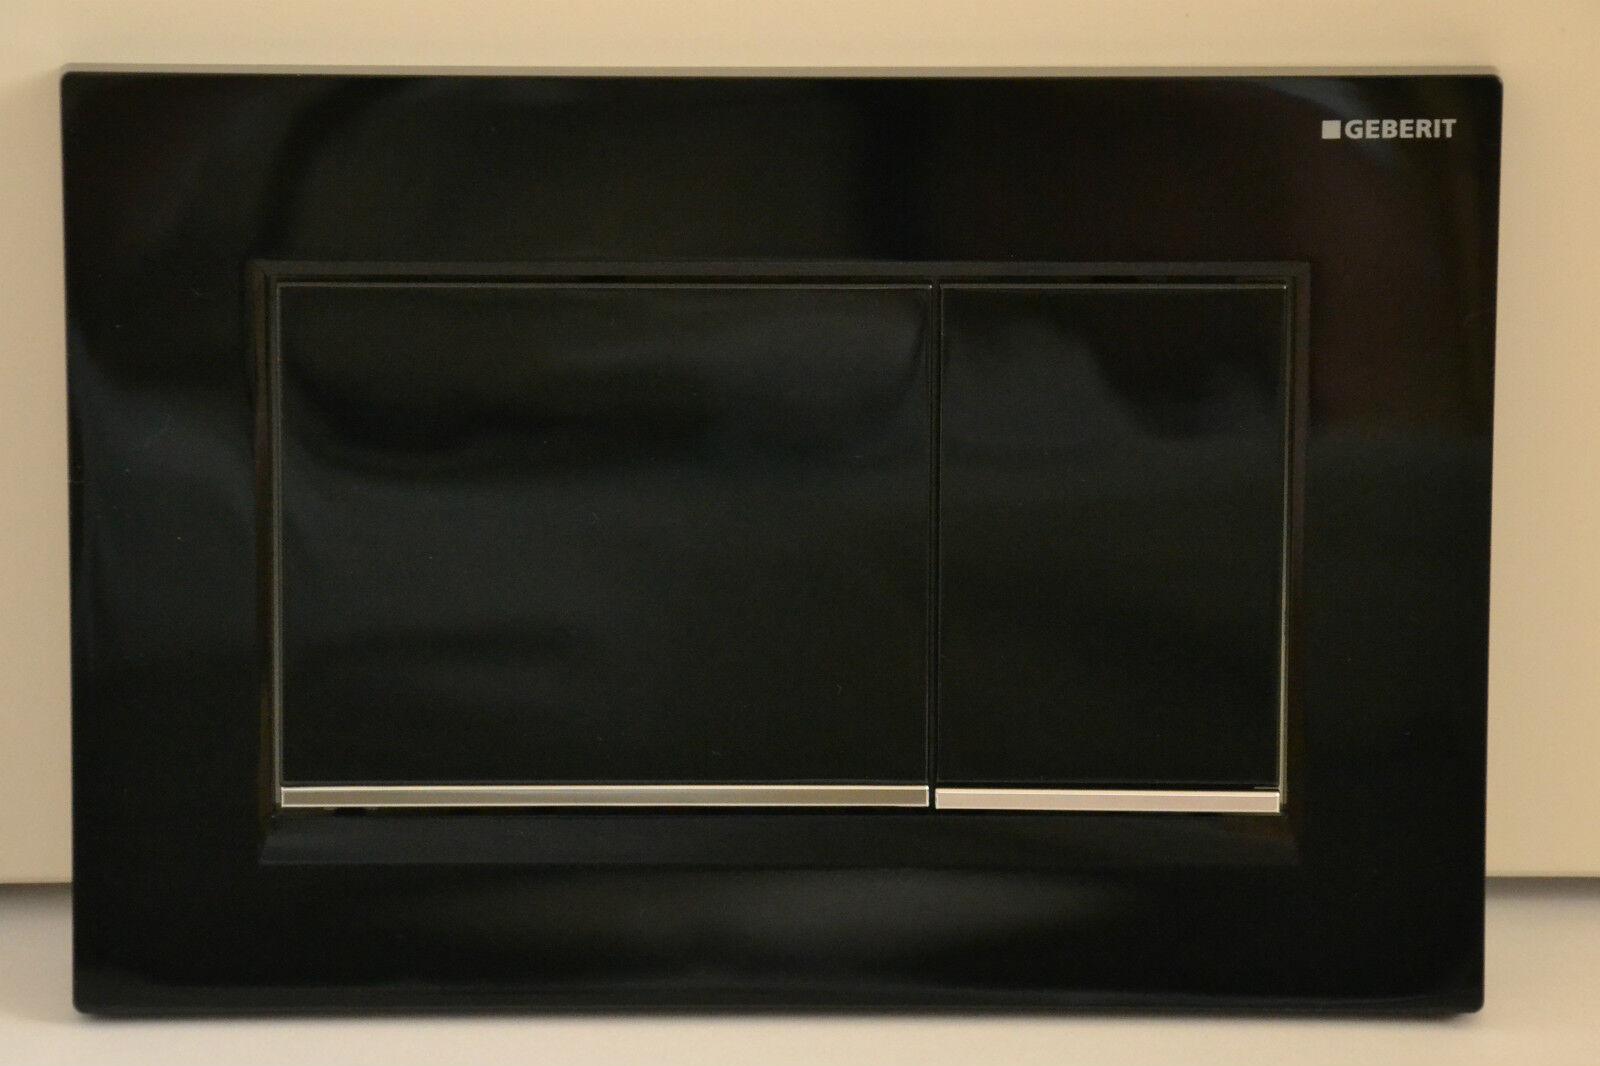 glanzchrom mehr als 100 angebote fotos preise. Black Bedroom Furniture Sets. Home Design Ideas